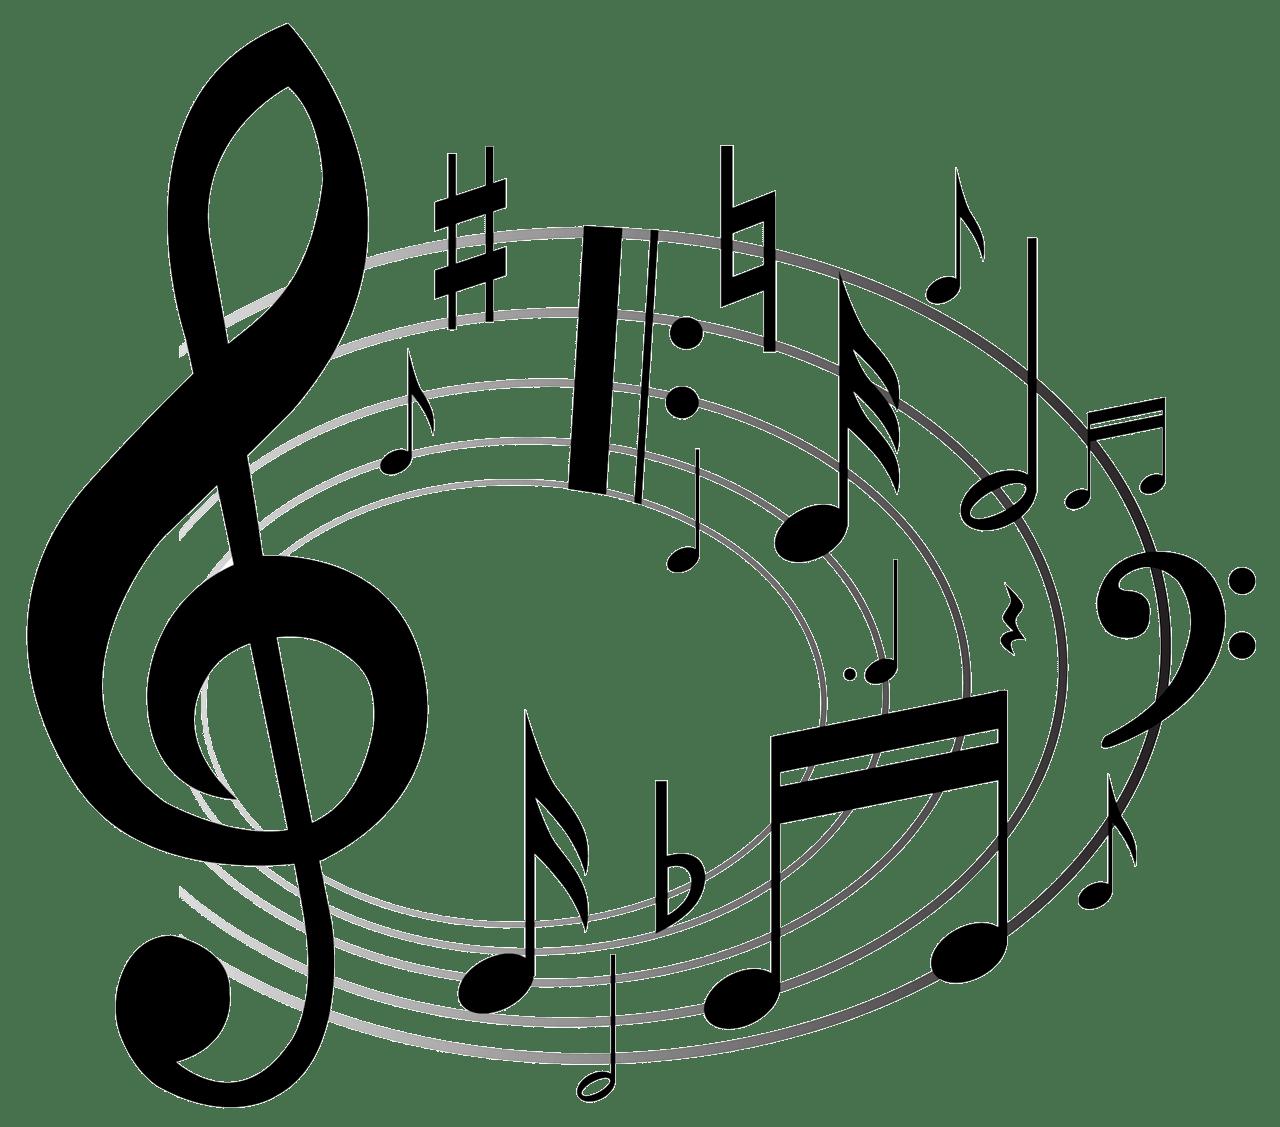 Musician clipart composer, Musician composer Transparent